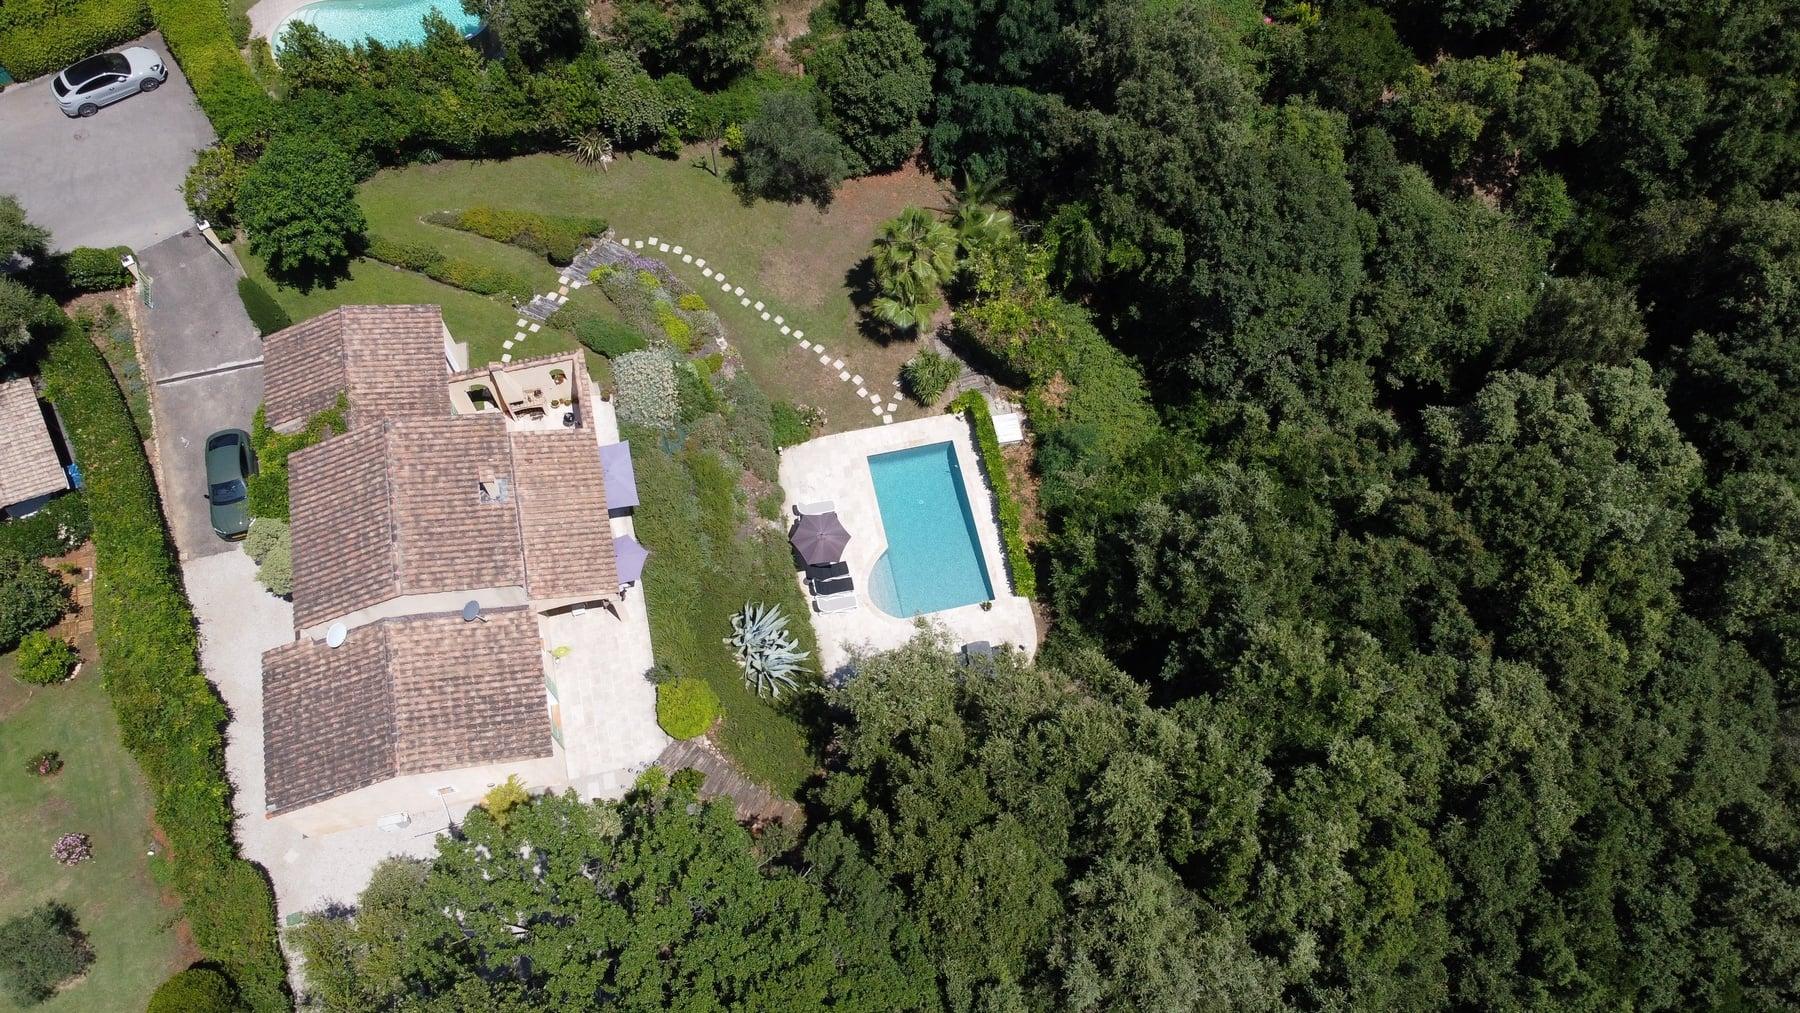 Holidayhome - Vacation rental Valbonne - Drone photos